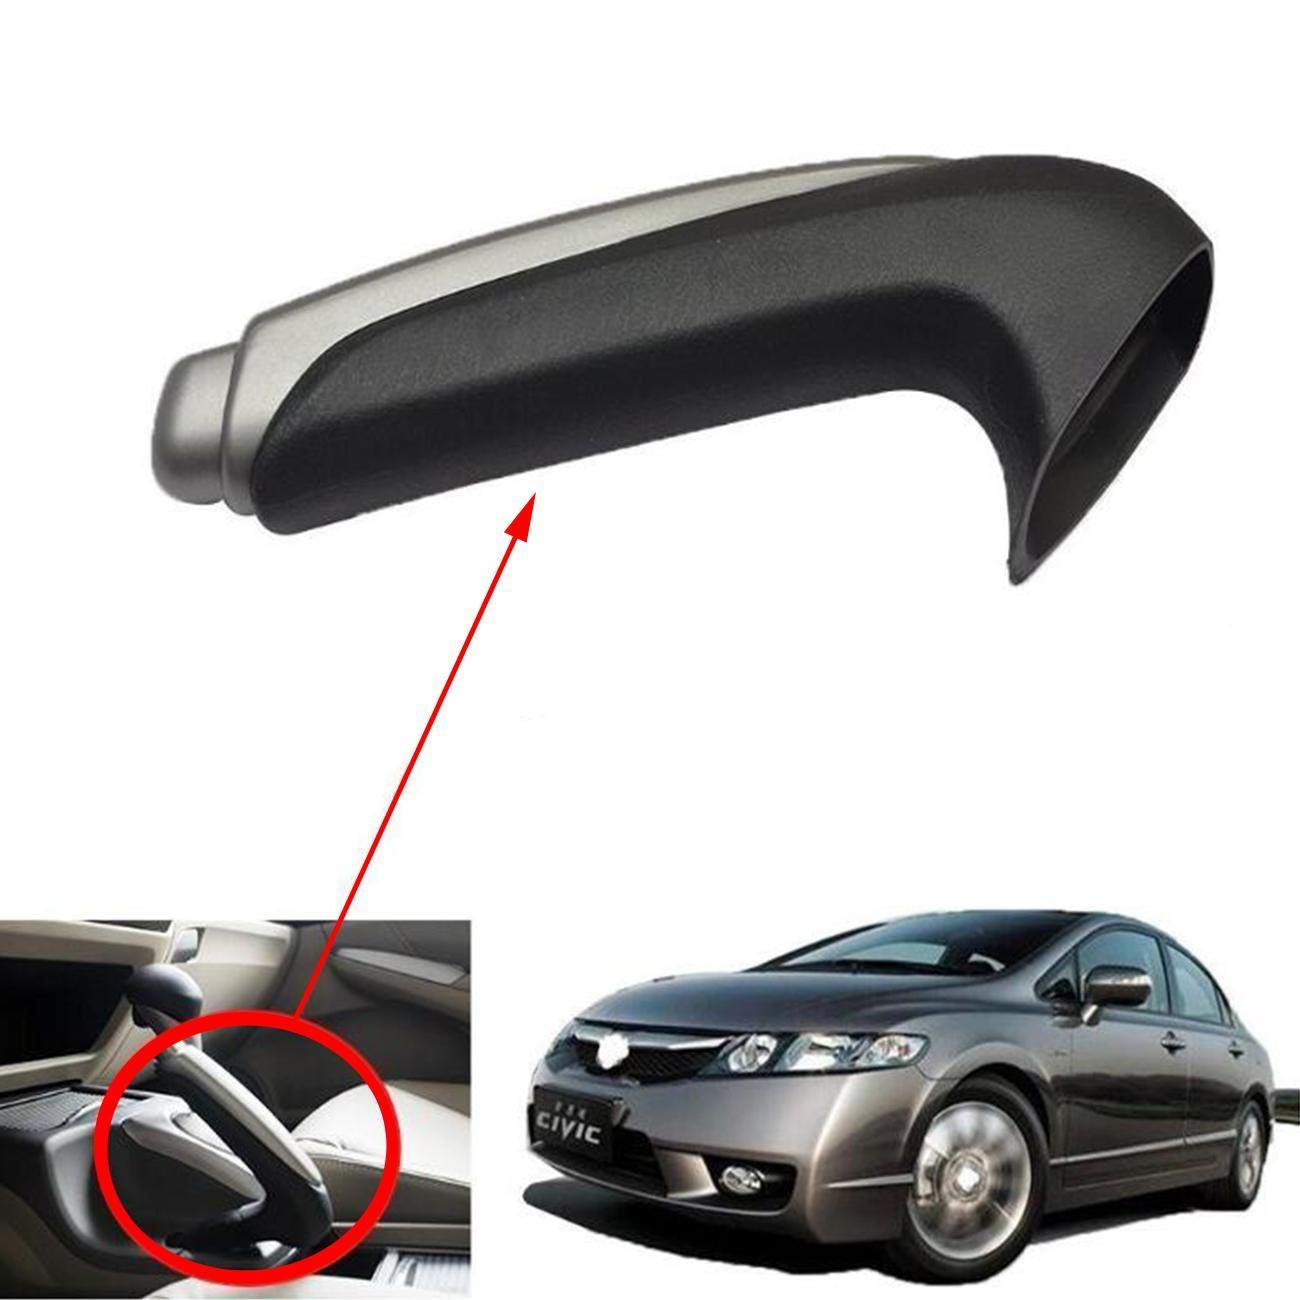 ANTS PART Parking Brake Handle Grip and Knob Set Fits for 2006-2011 Honda Civic #47115-SNA-A82ZA